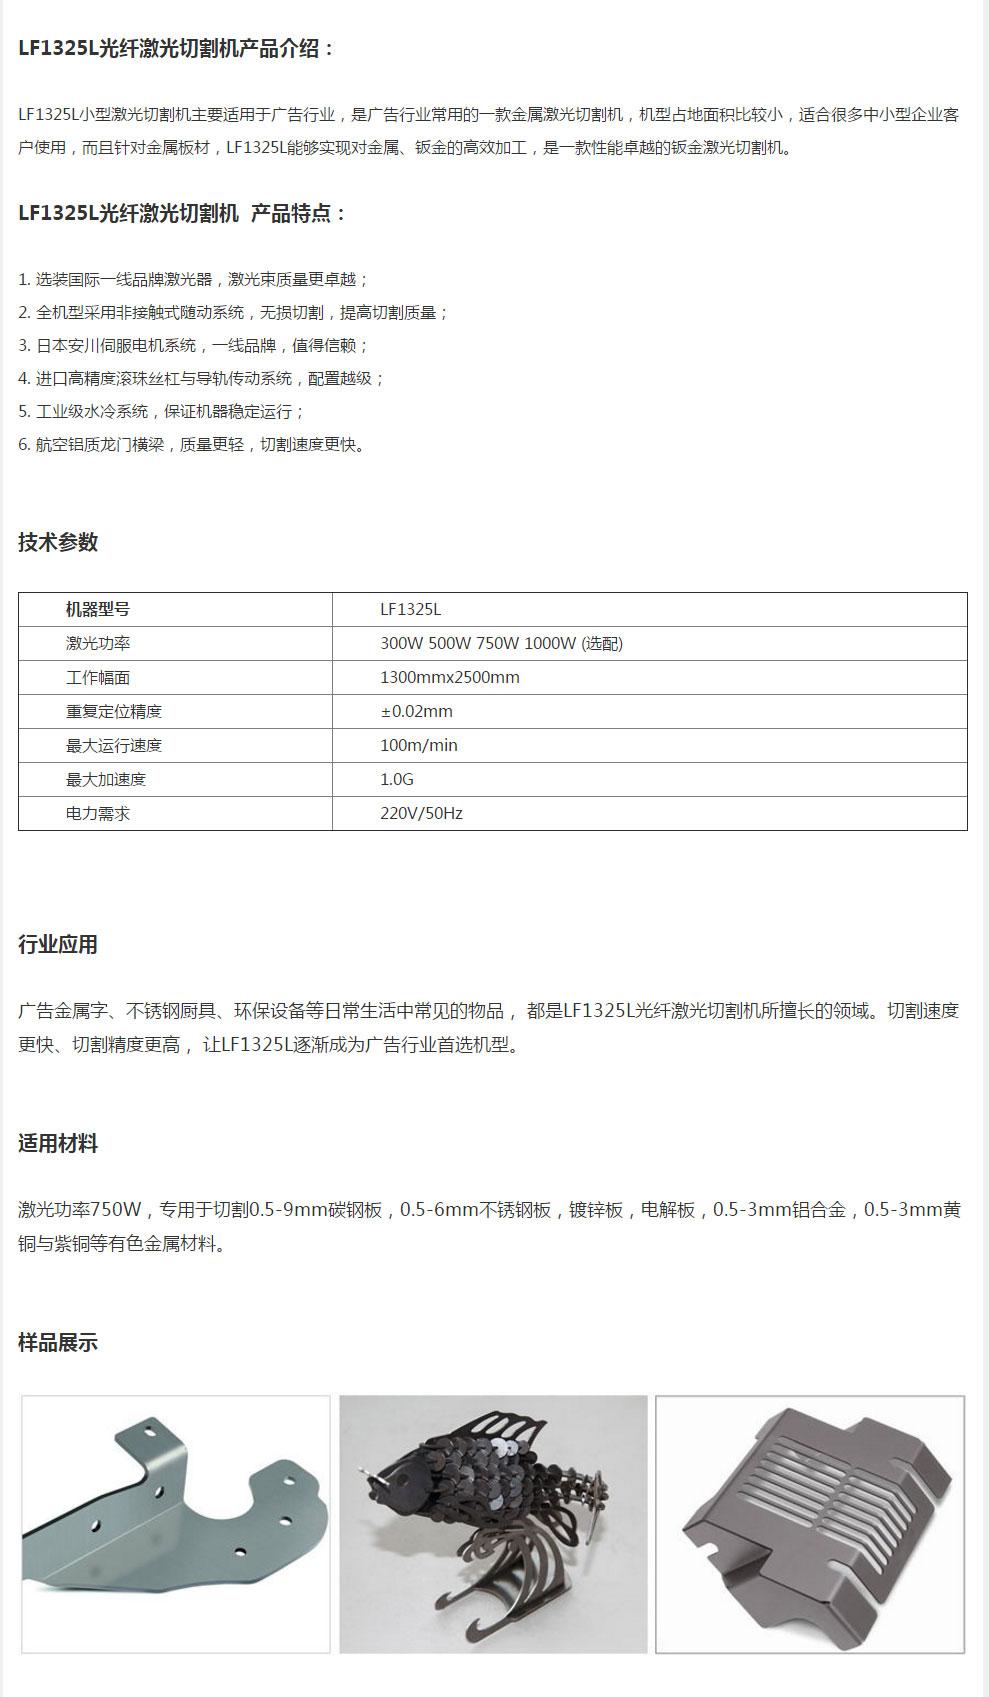 LF1325L-光纤激光bwin手机网页  说明.jpg